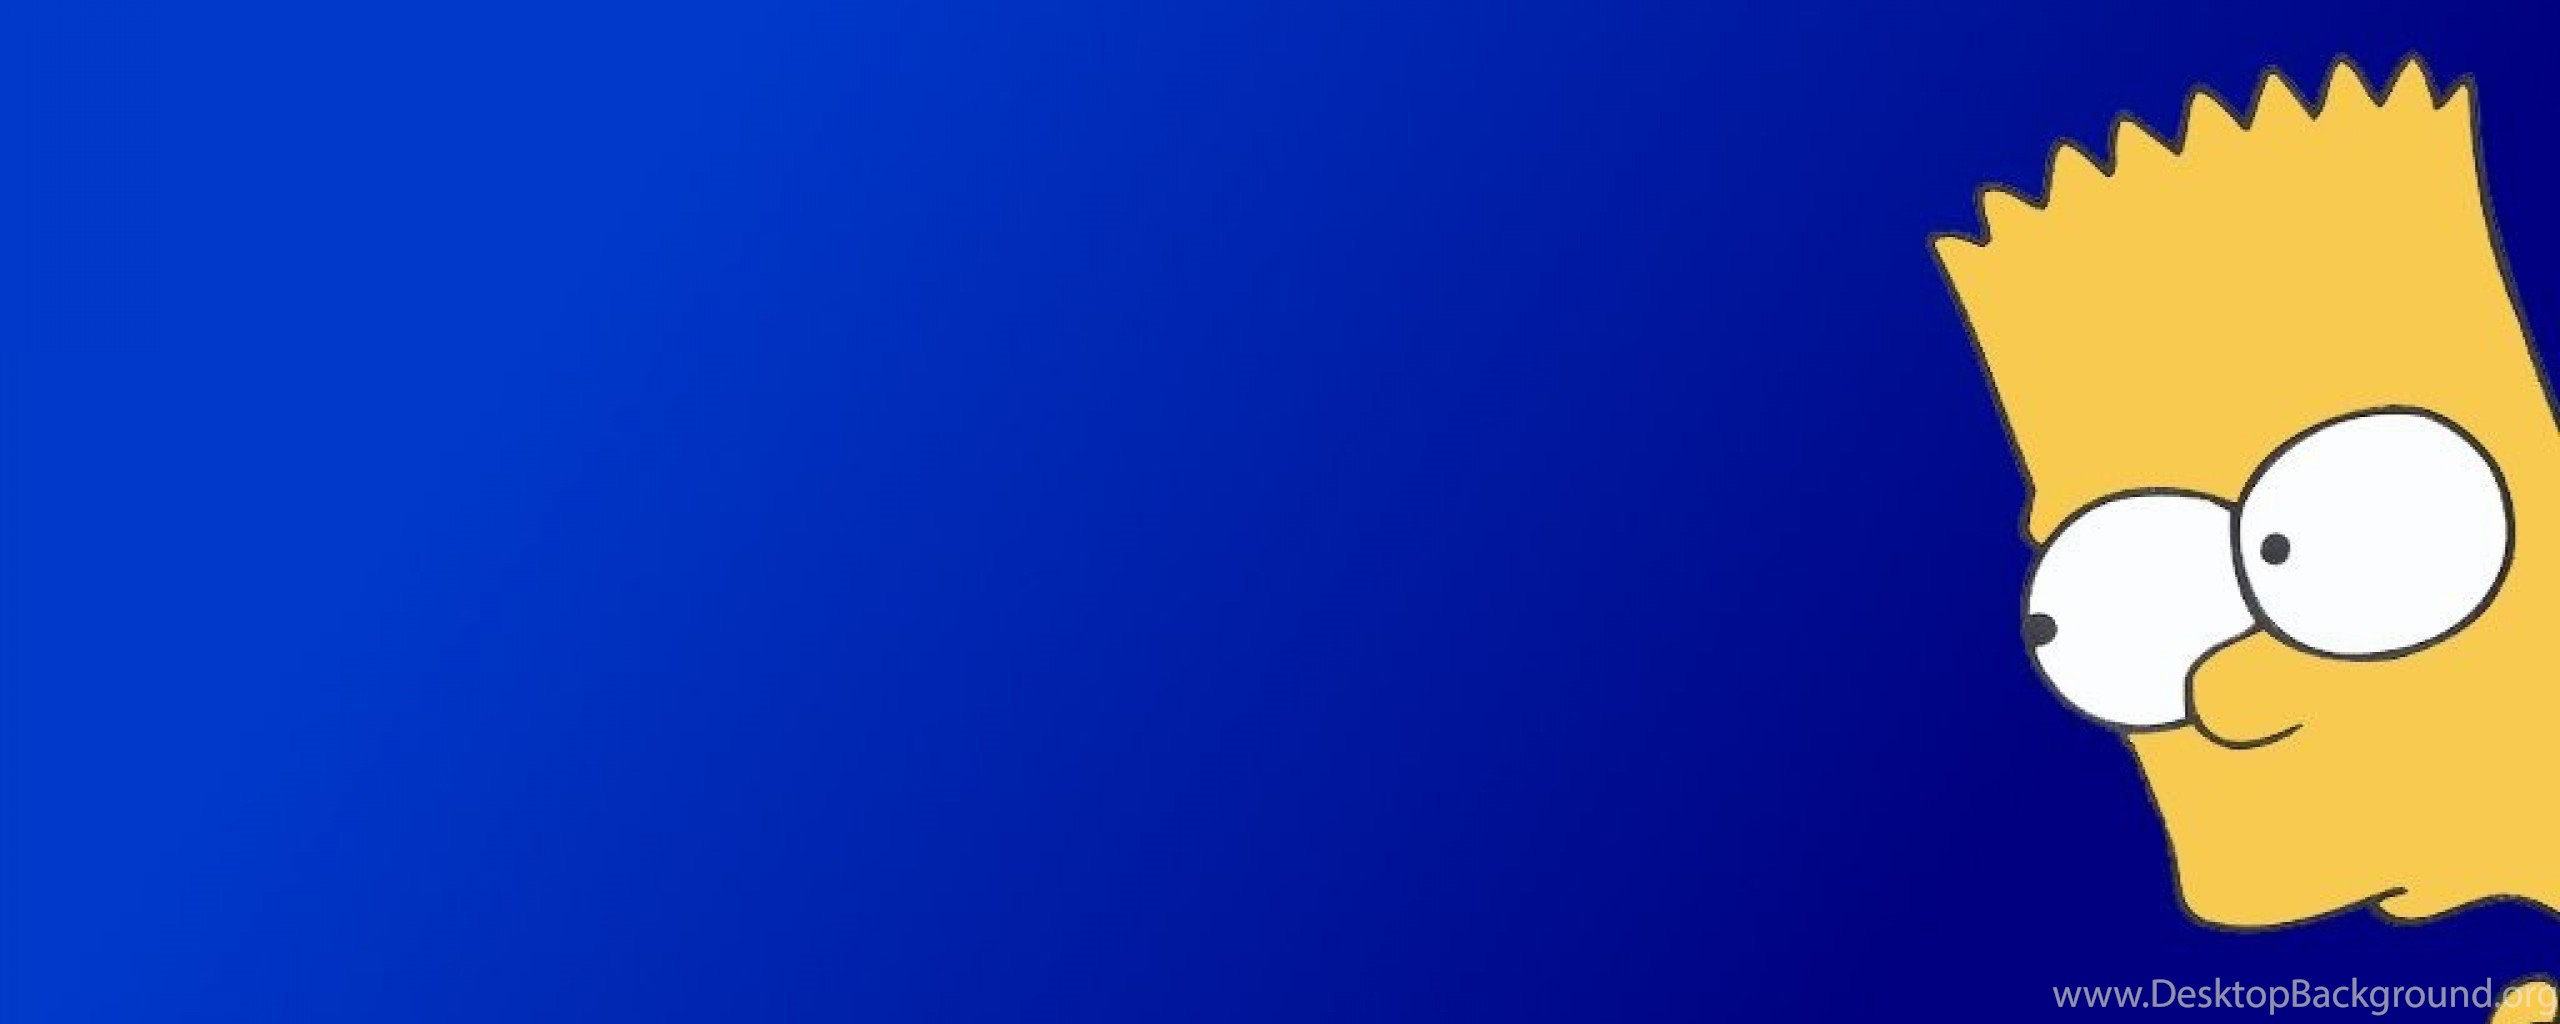 The Simpsons HD Wallpapers For Desktop Download Desktop Background